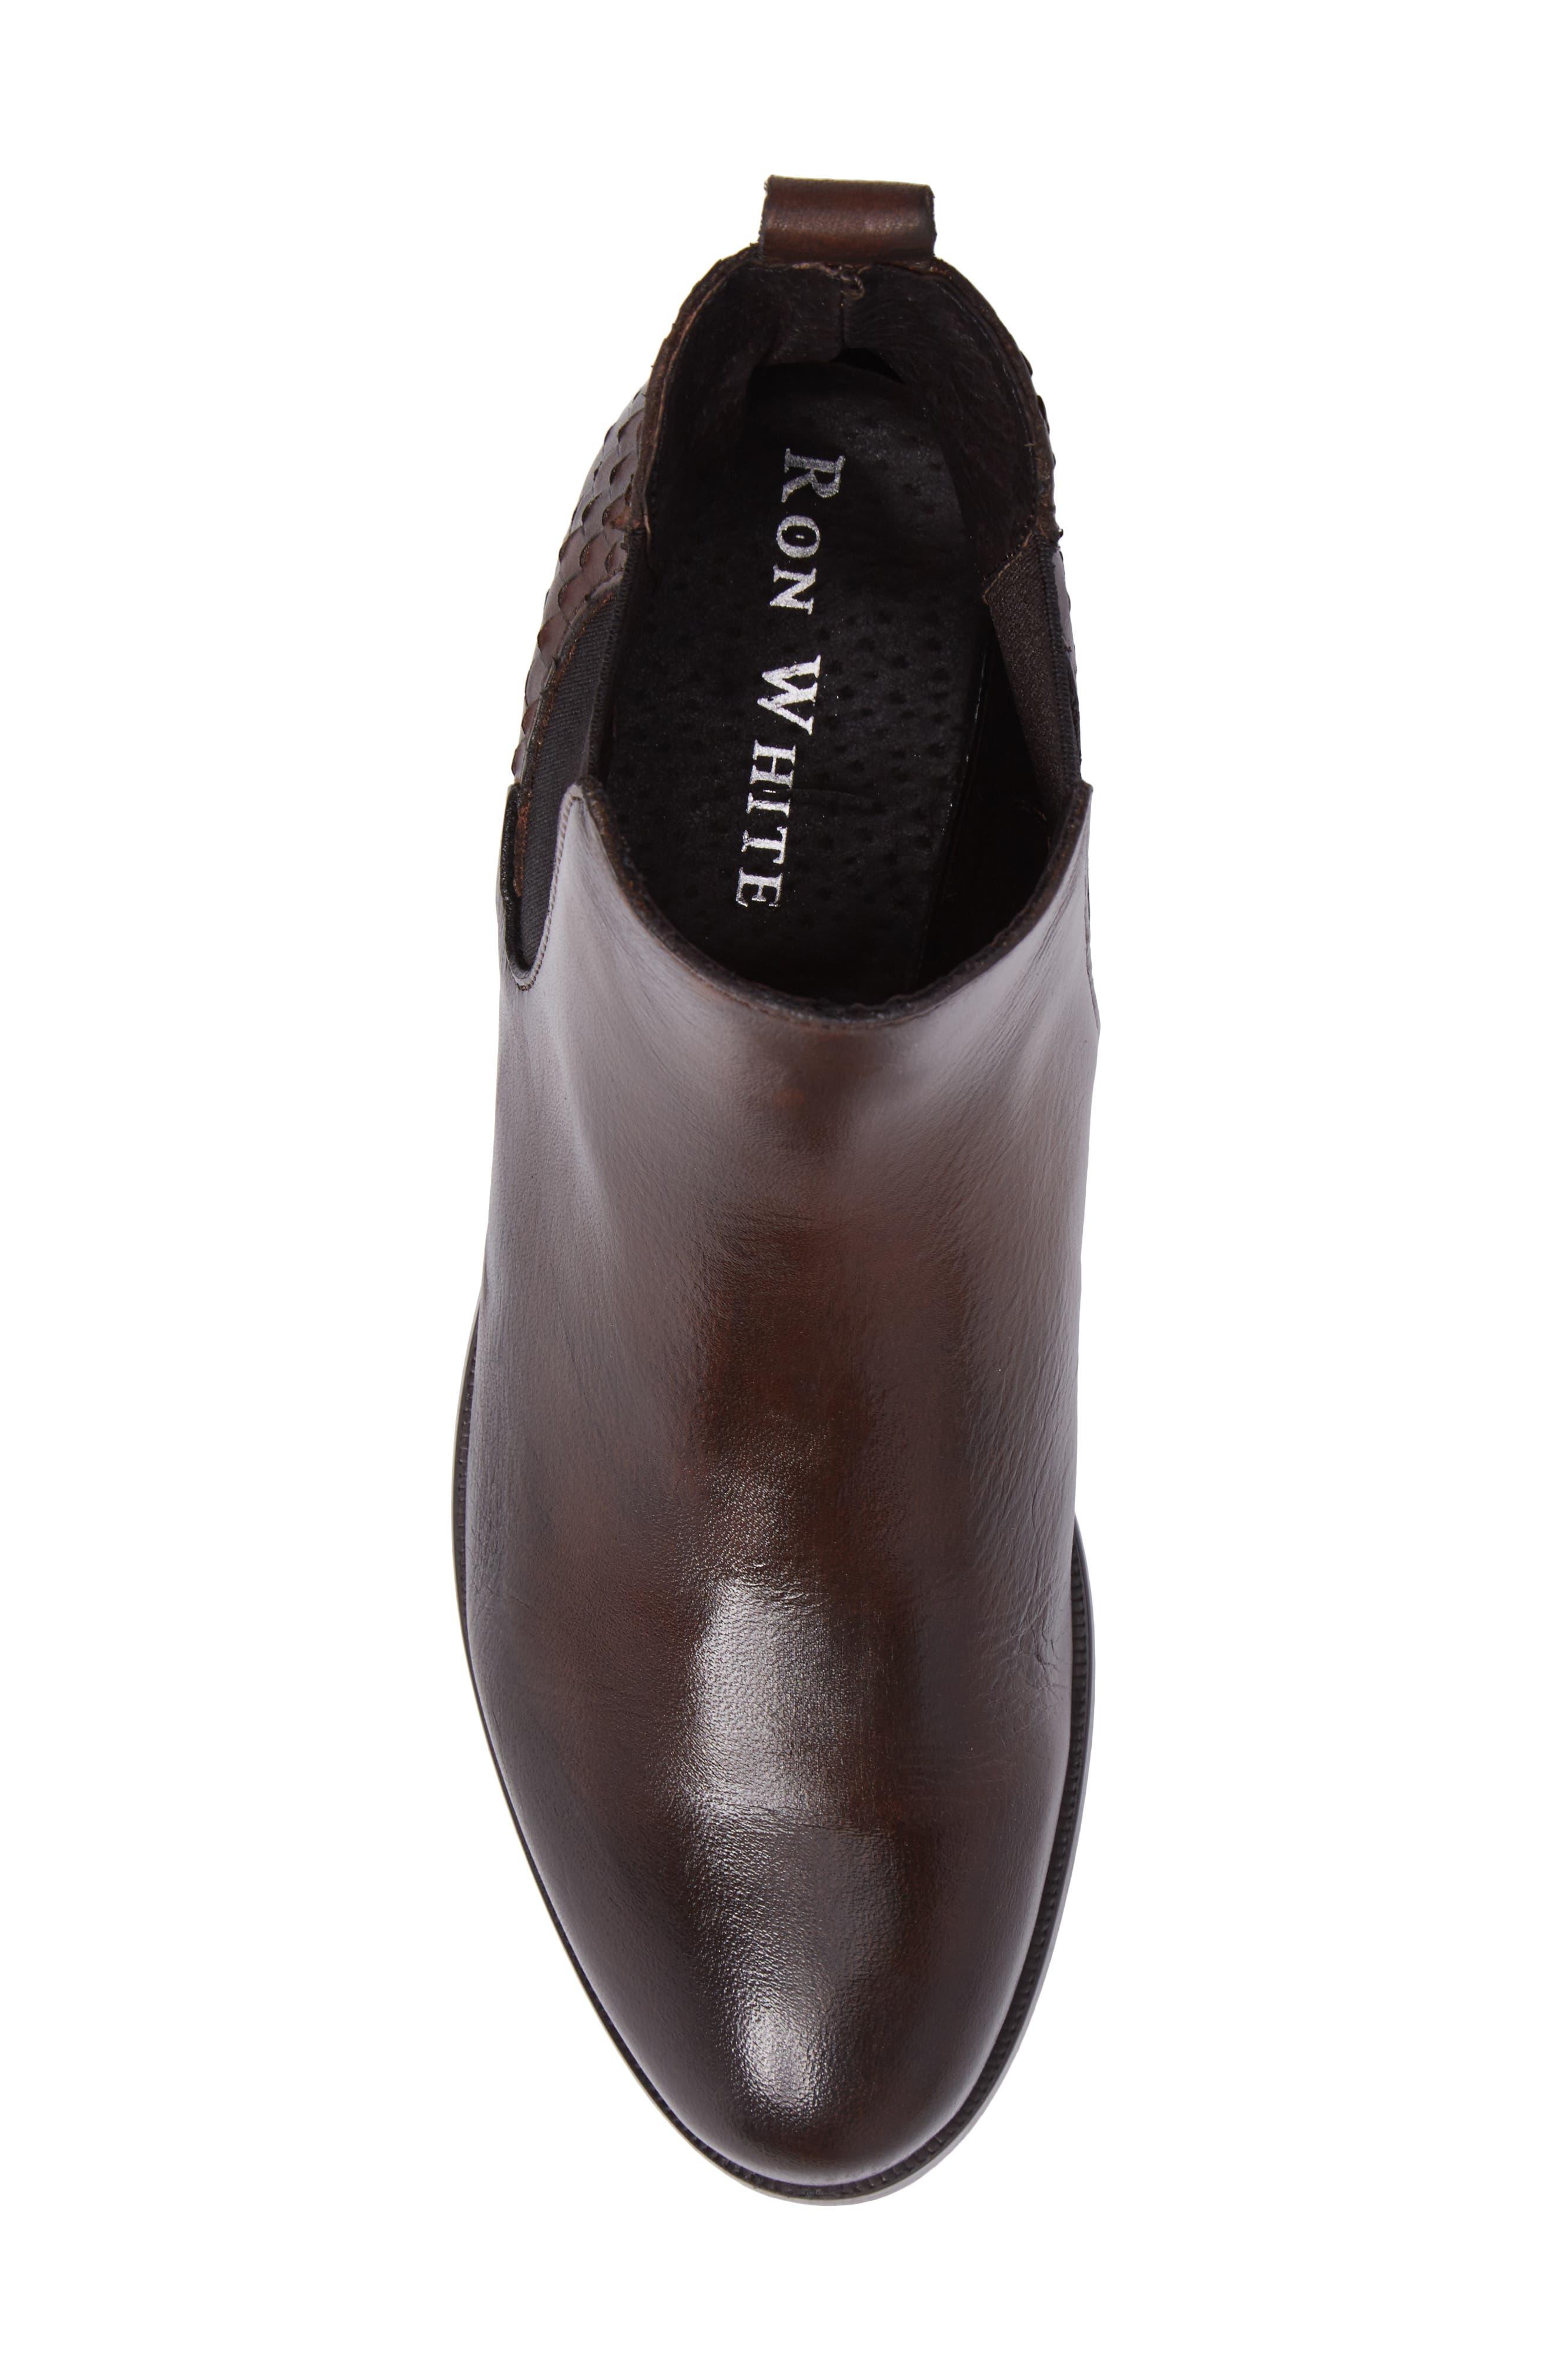 Padamae Water Resistant Chelsea Boot,                             Alternate thumbnail 5, color,                             Onyx Suede